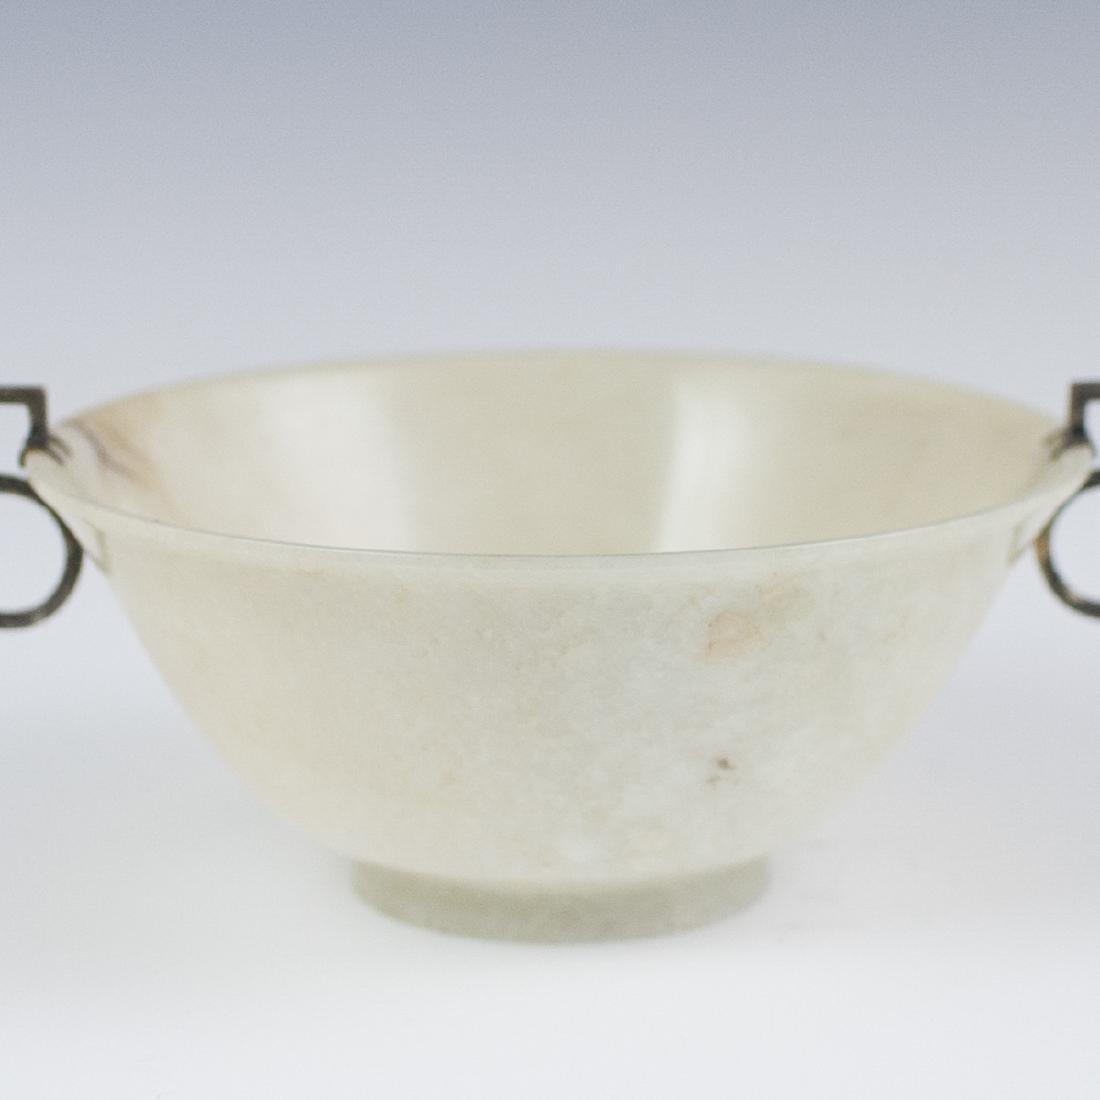 Chinese Silver Mounted White Jade Bowl - 5